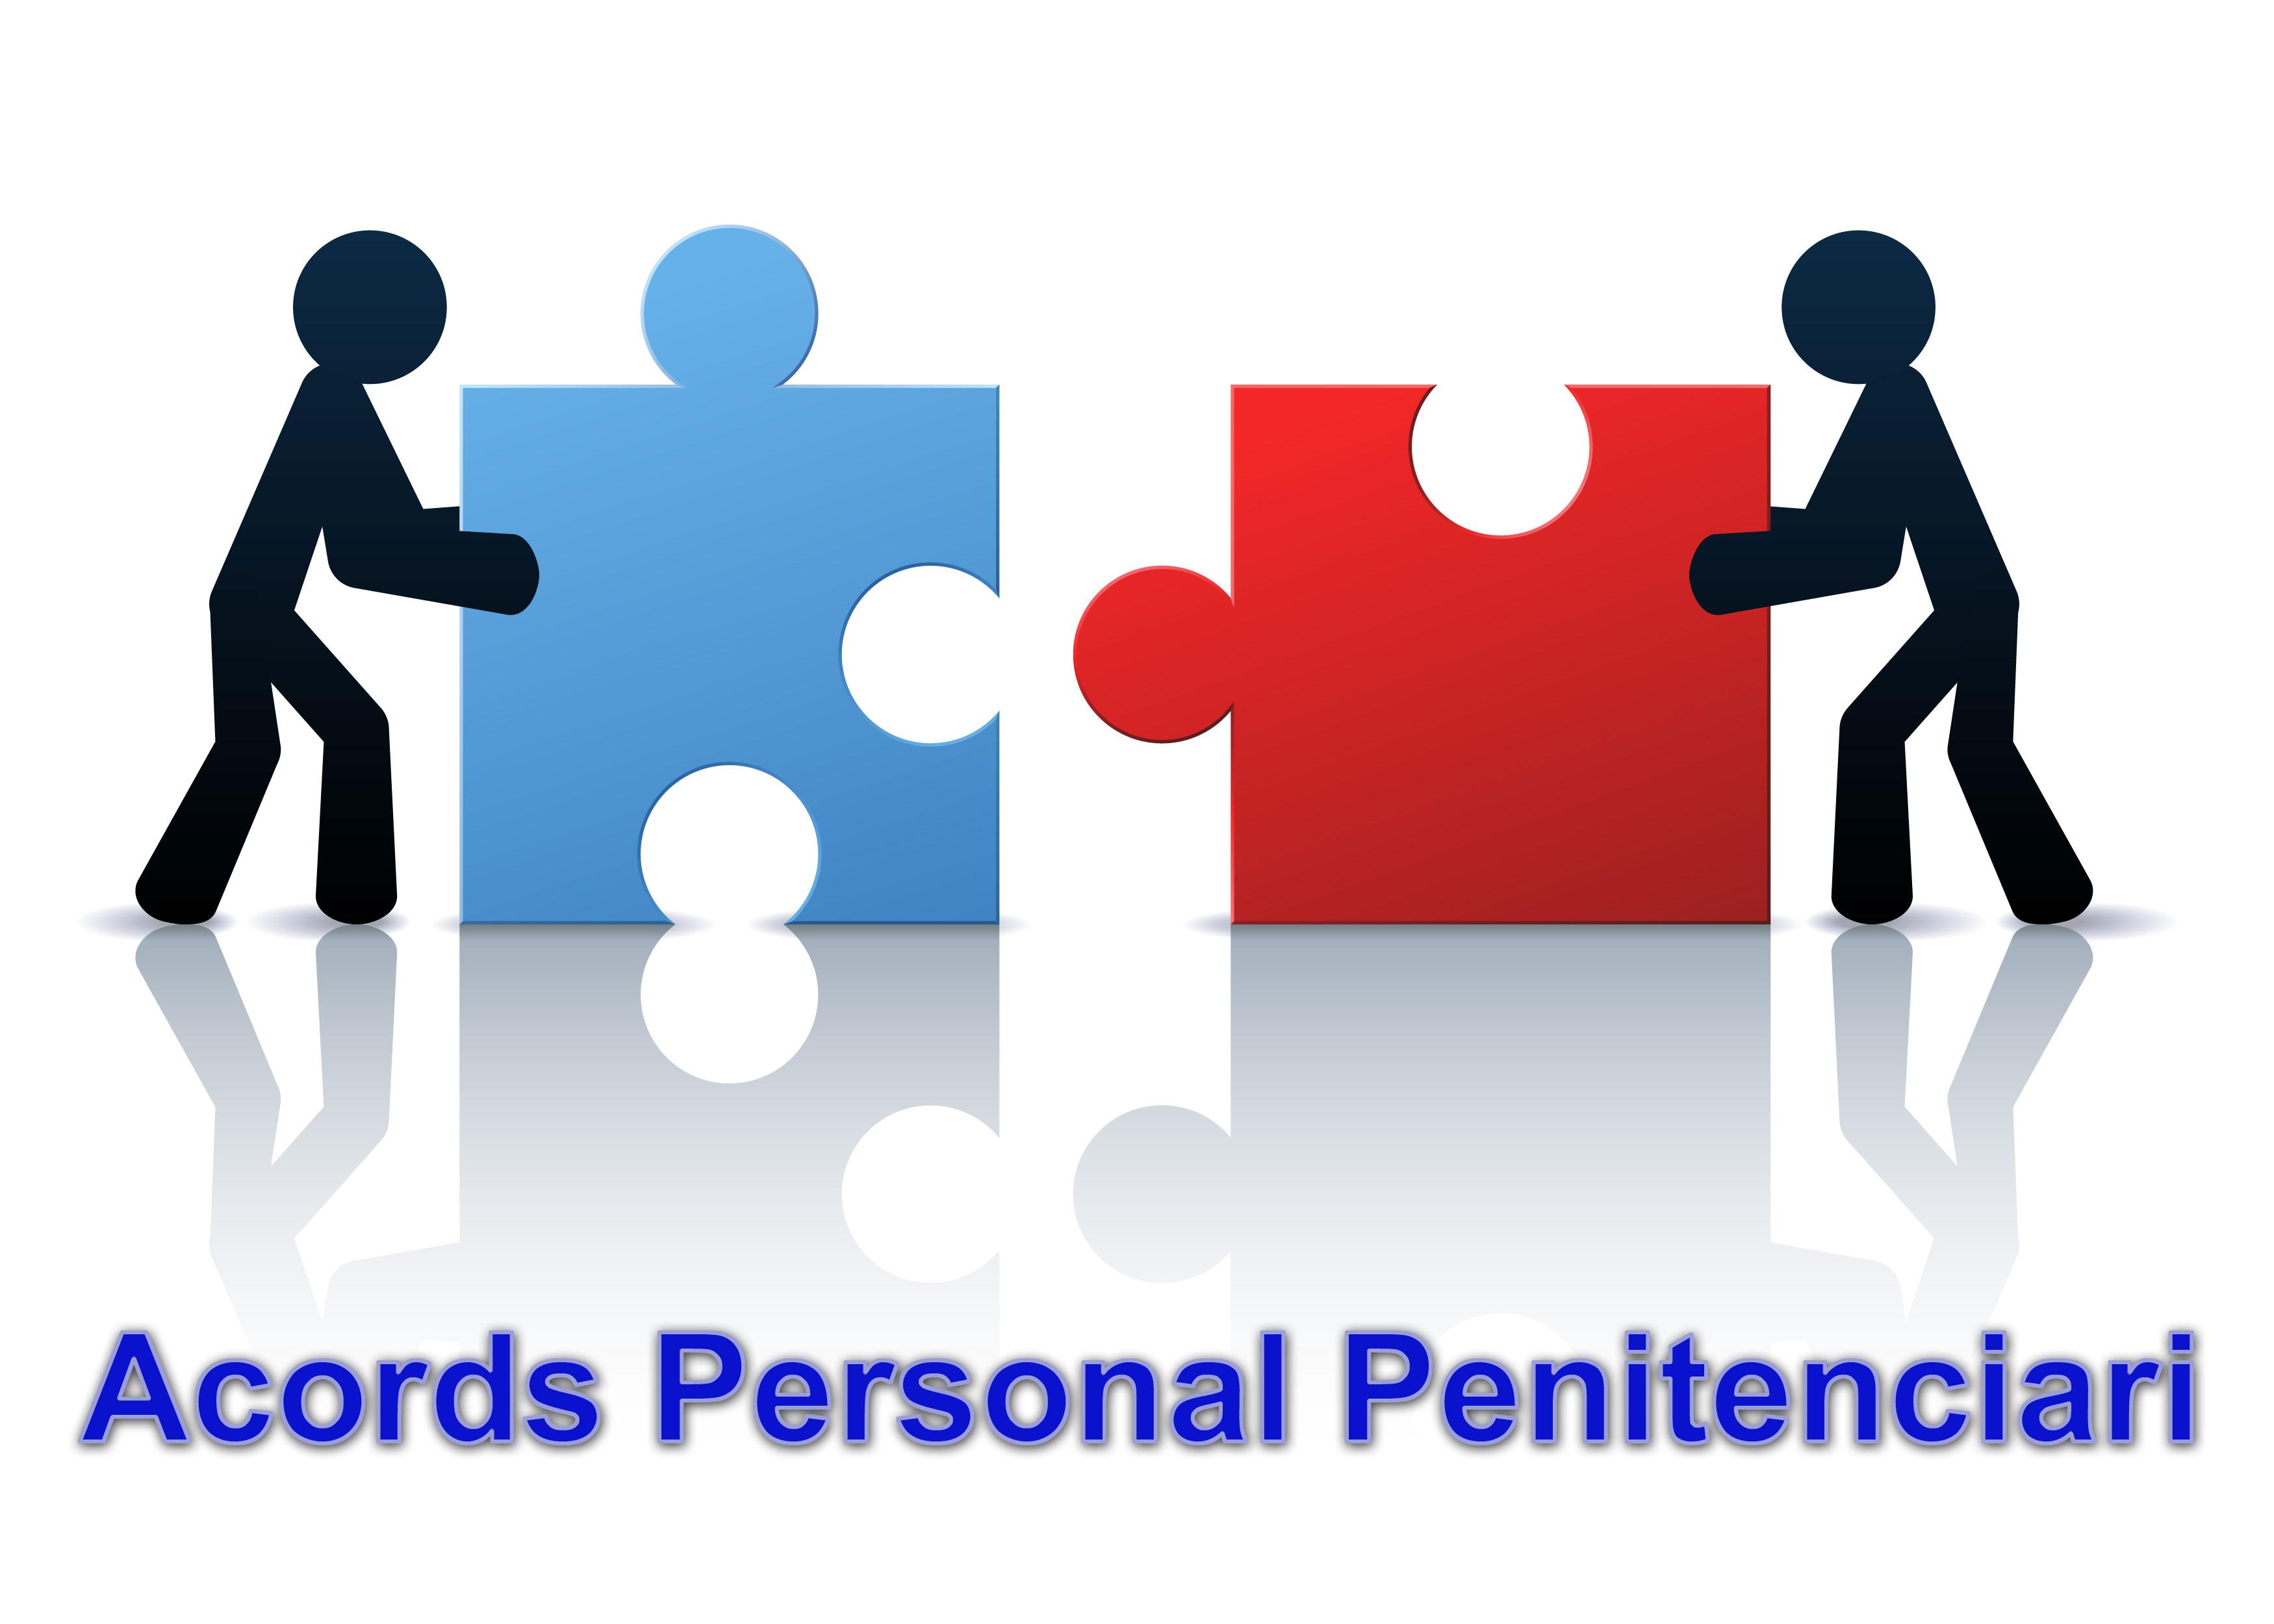 Acords Personal Penitenciari